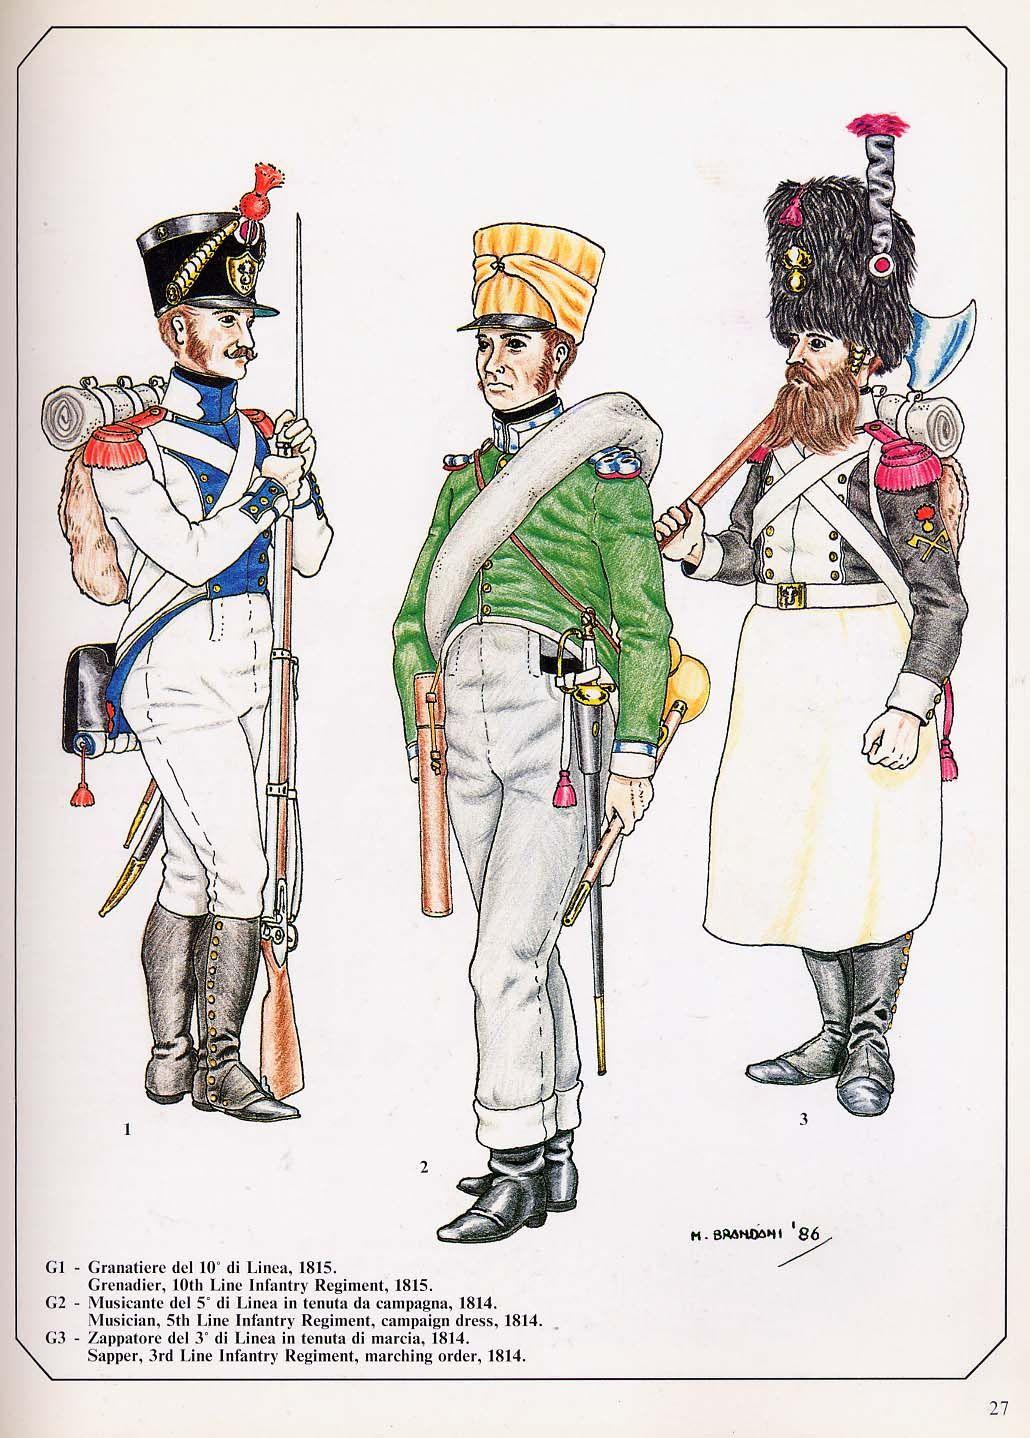 Neapolitan Army 1806-15 - Line Infantry